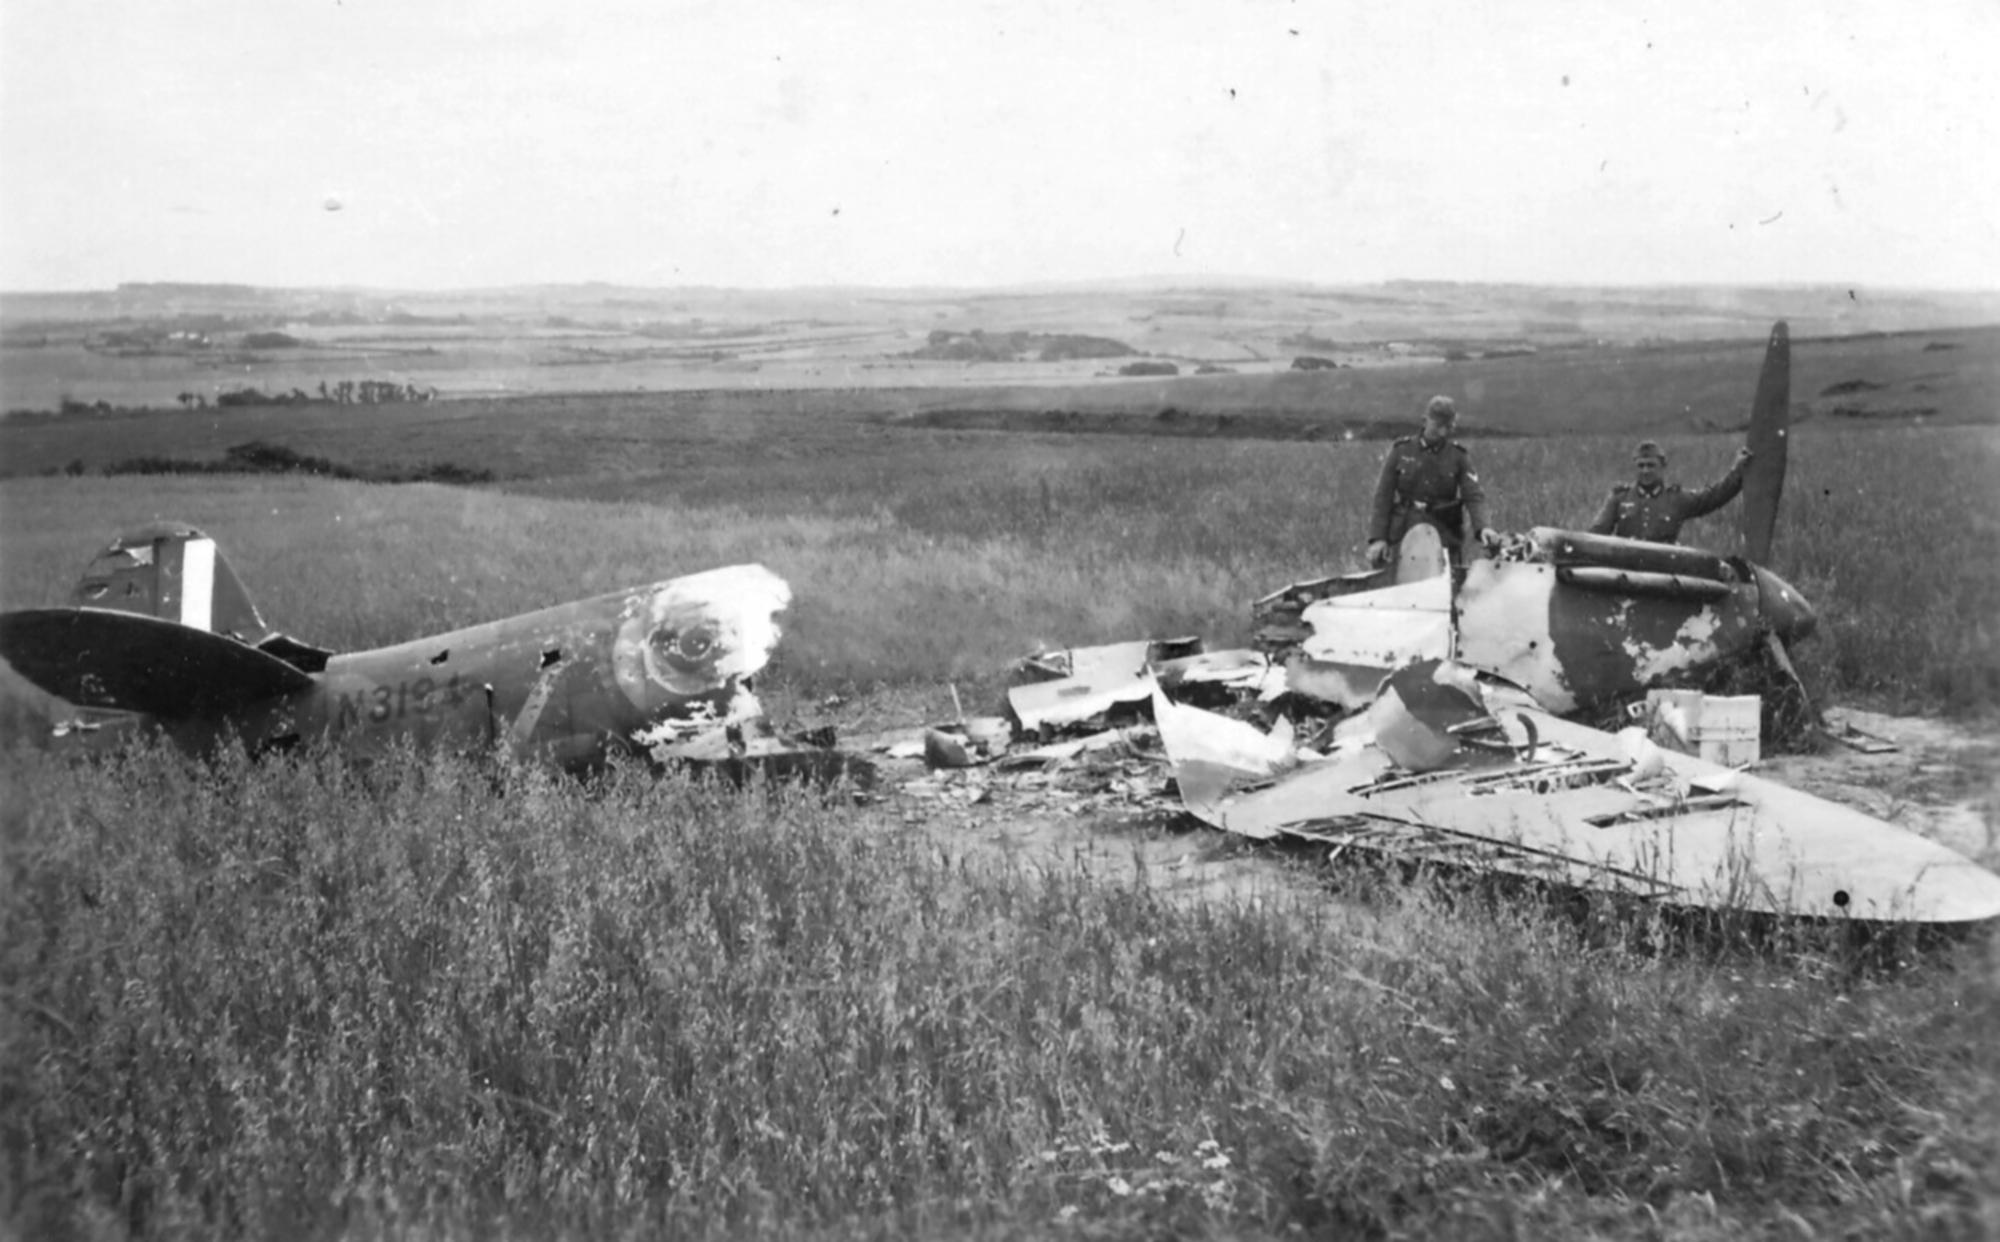 Spitfire MkIa RAF 92Sqn QJZ N3194 sd by Bf 109s near Calais 23rd May 1940 ebay1